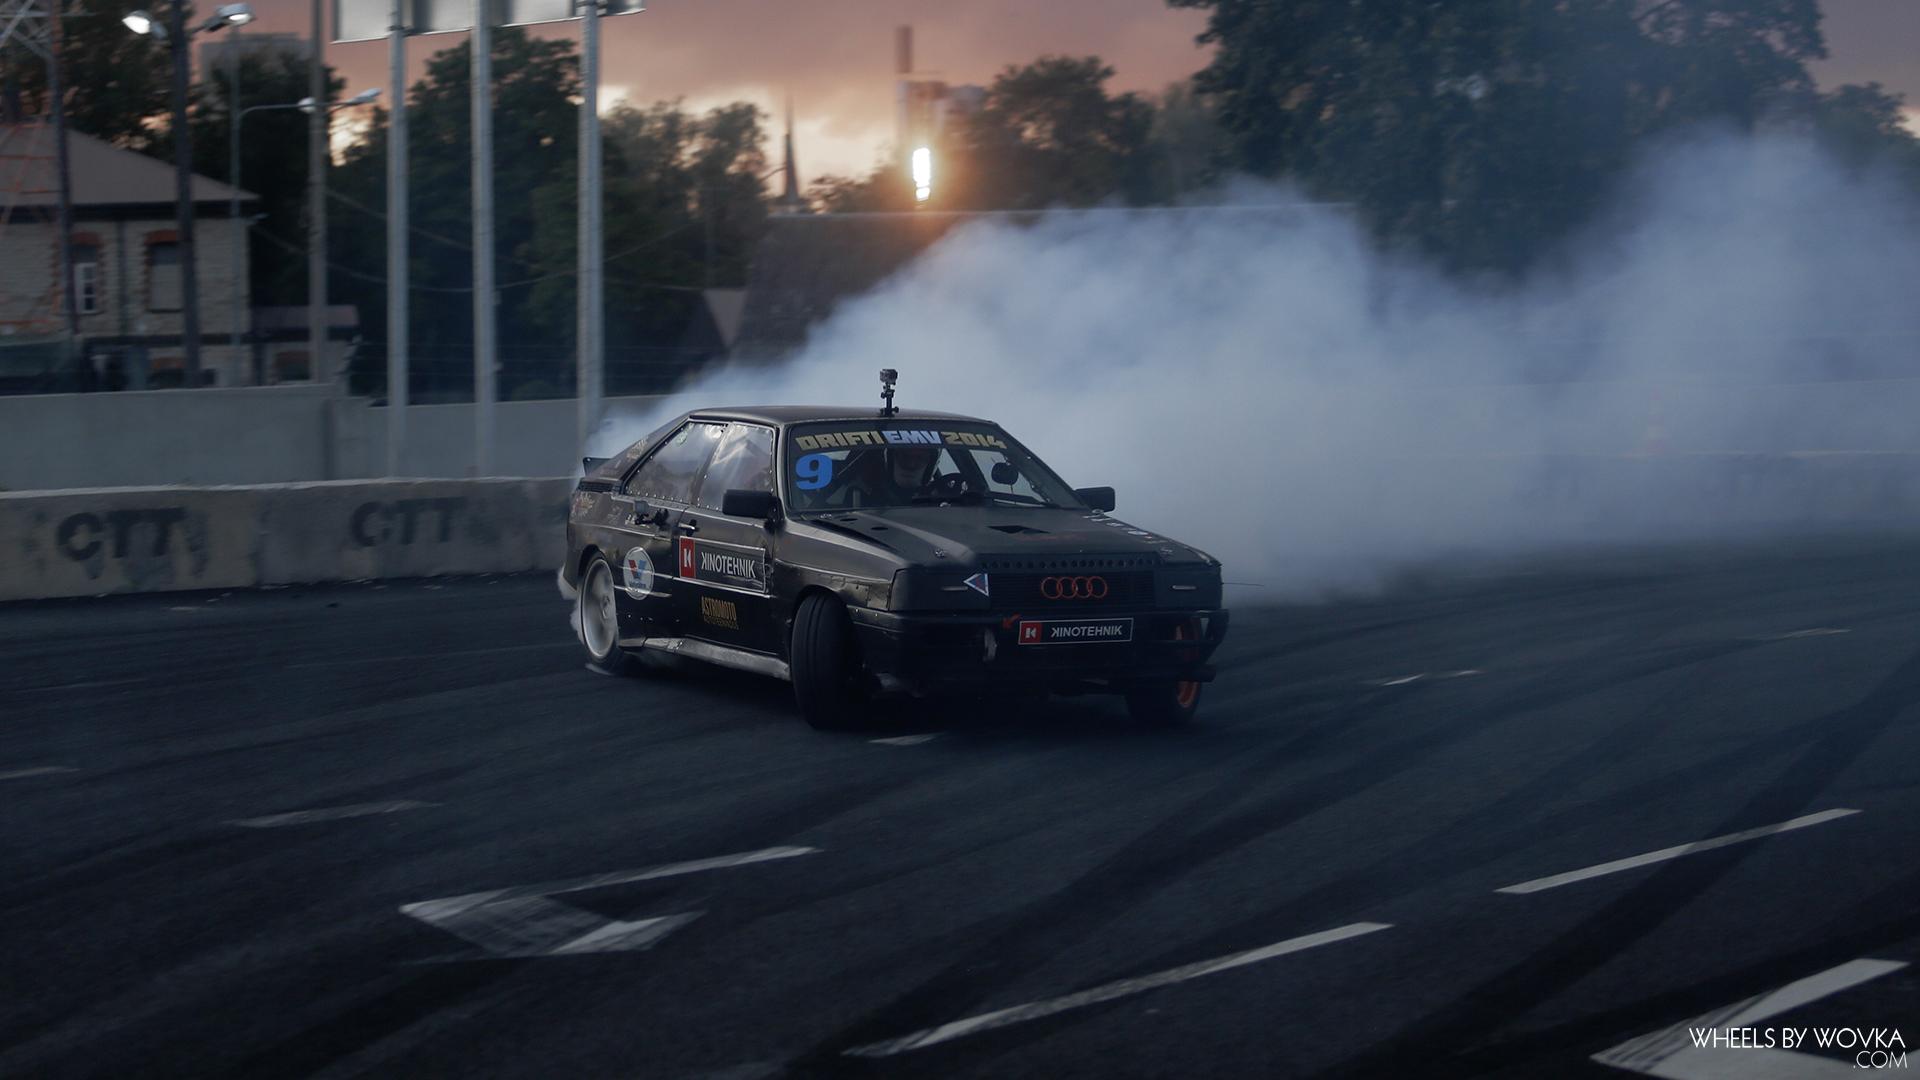 10-years-of-drifting-in-estonia-2014-by-wheelsbywovka-5